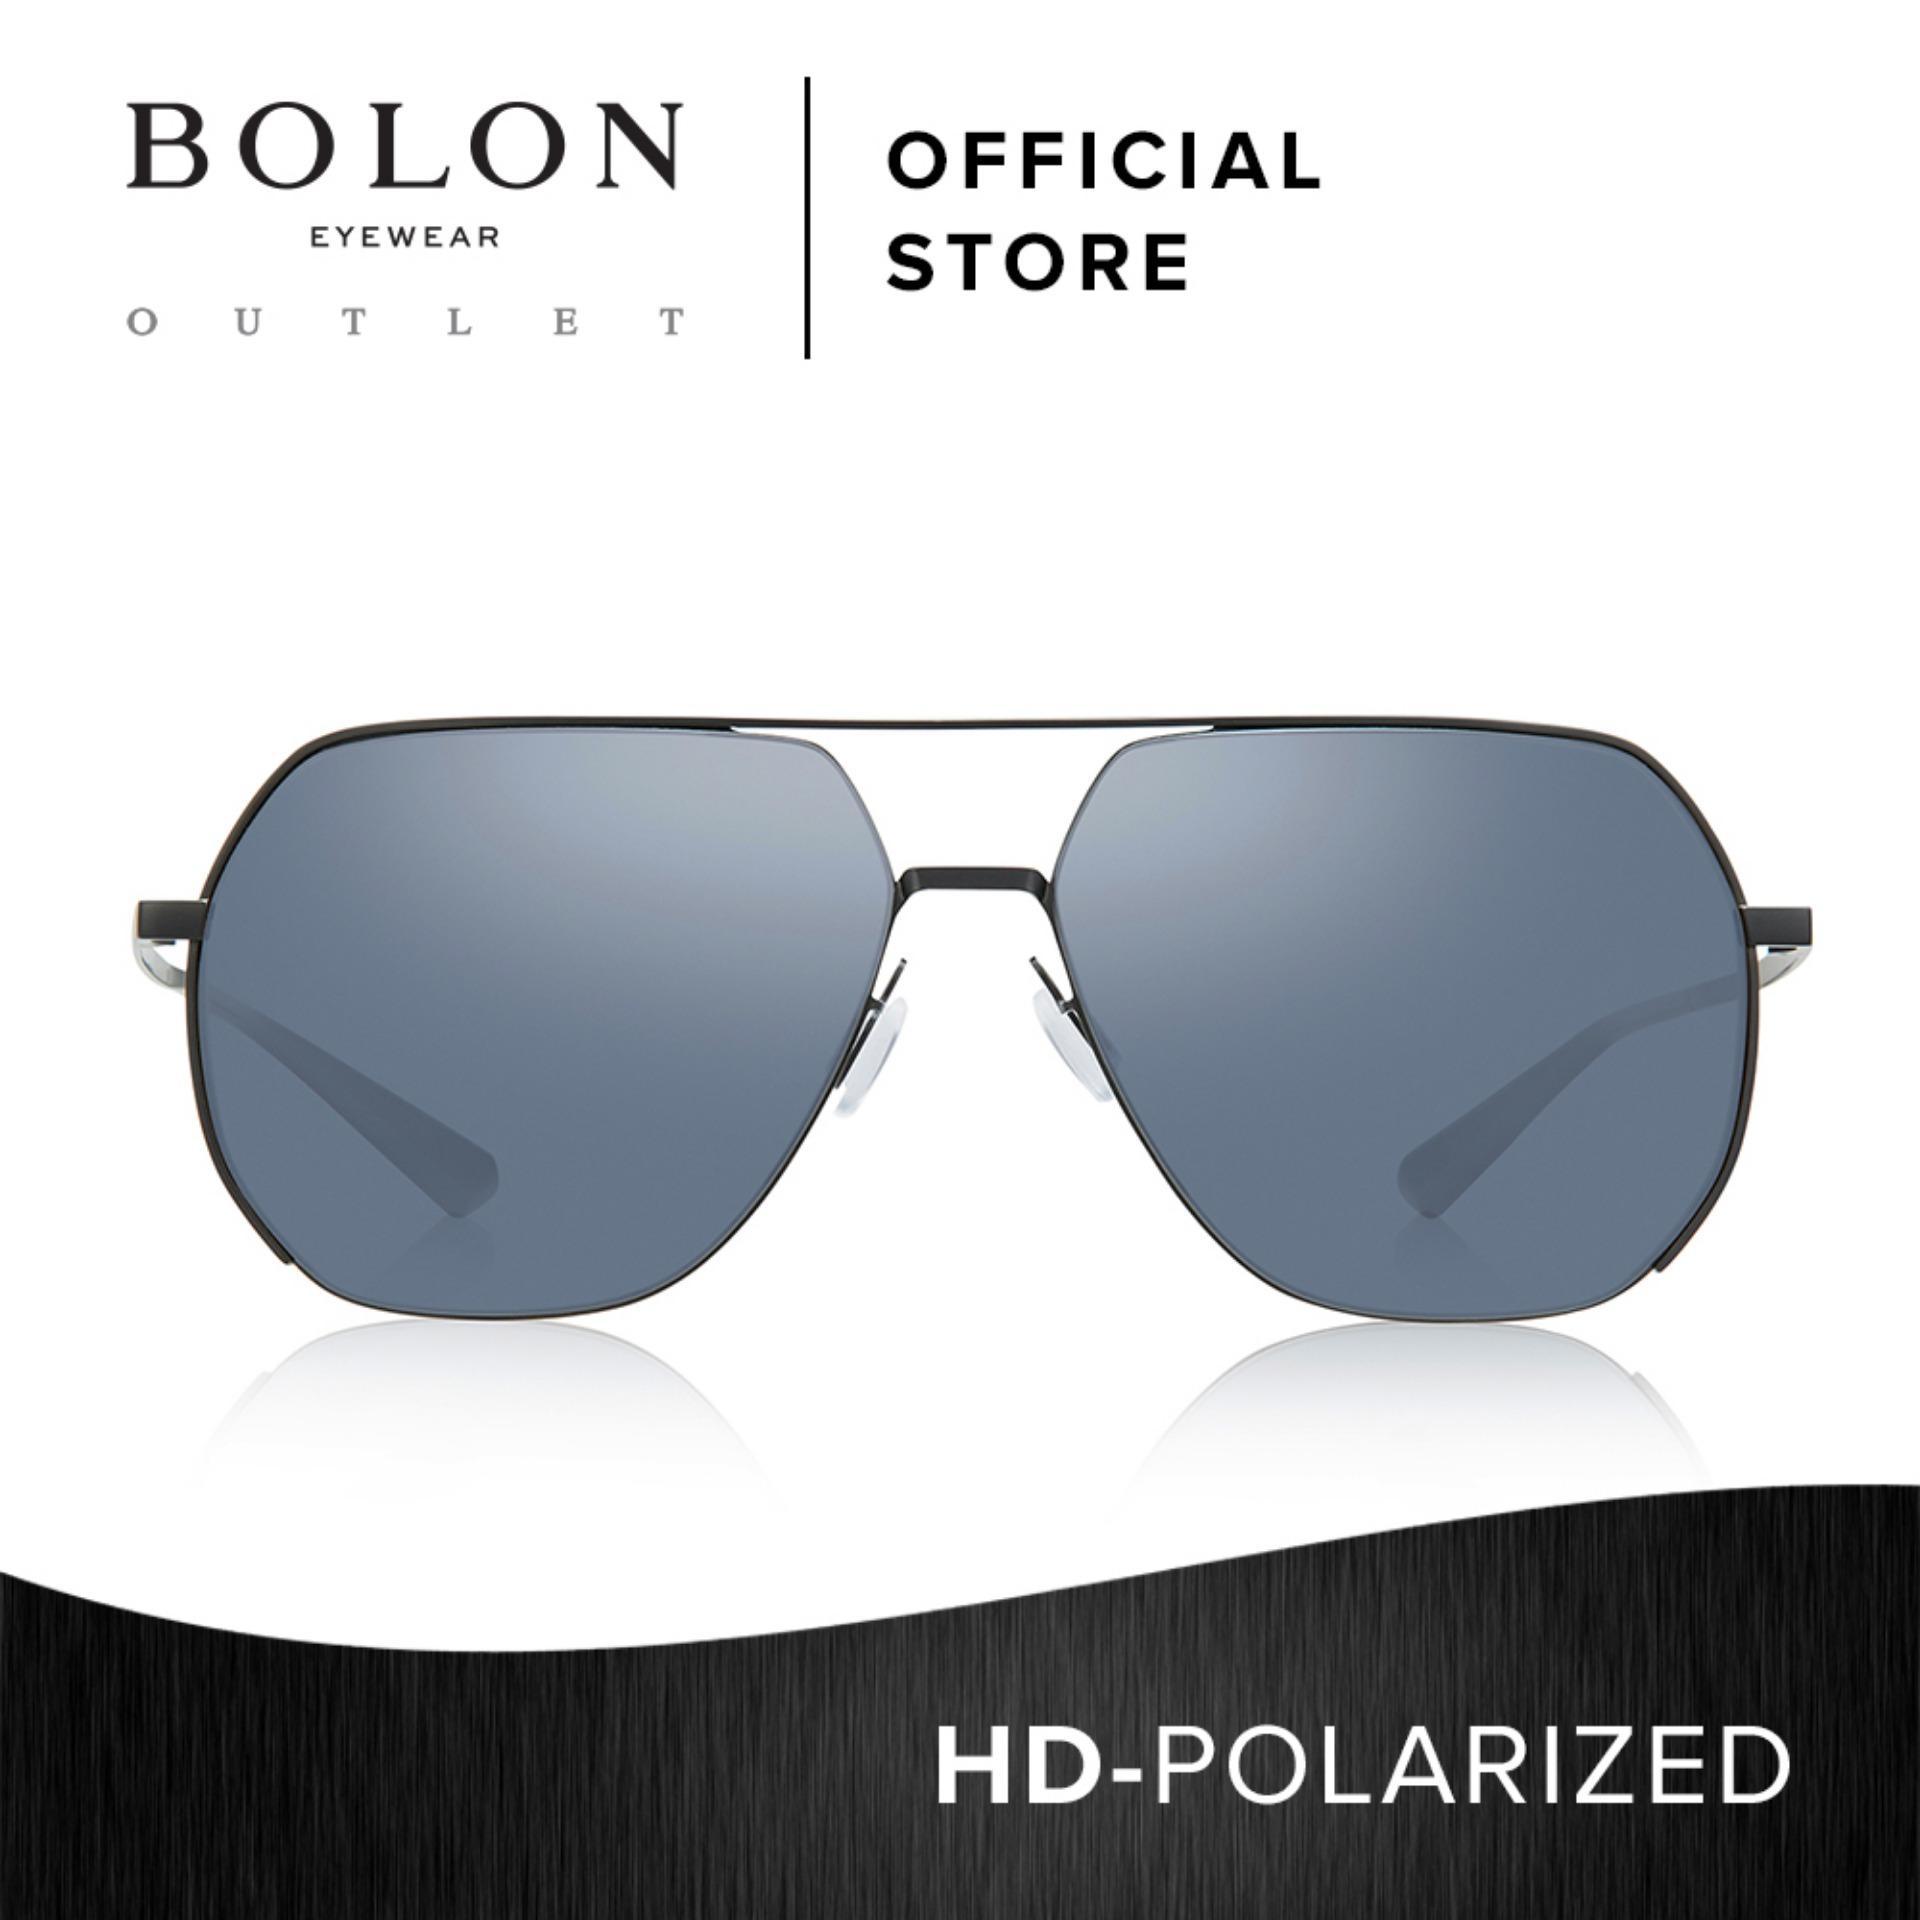 97626782dd BOLON Eyewear Men Polarized Aviator Sunglasses Brandy BL7021 Black